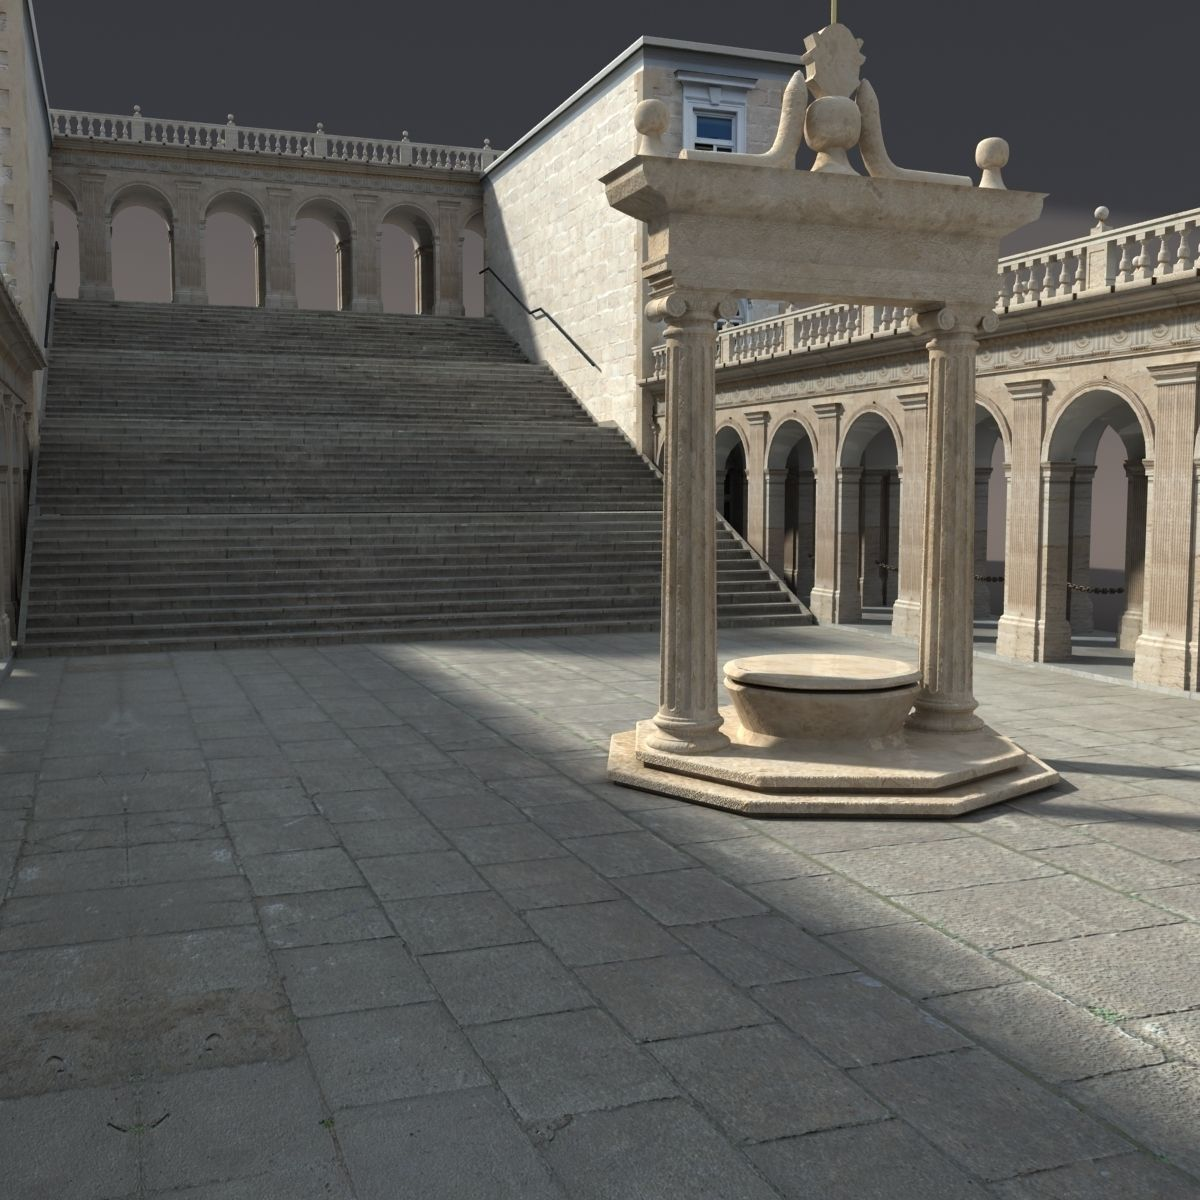 Montecassino Castle - Patio 3D Model .3ds .mtl - CGTrader.com